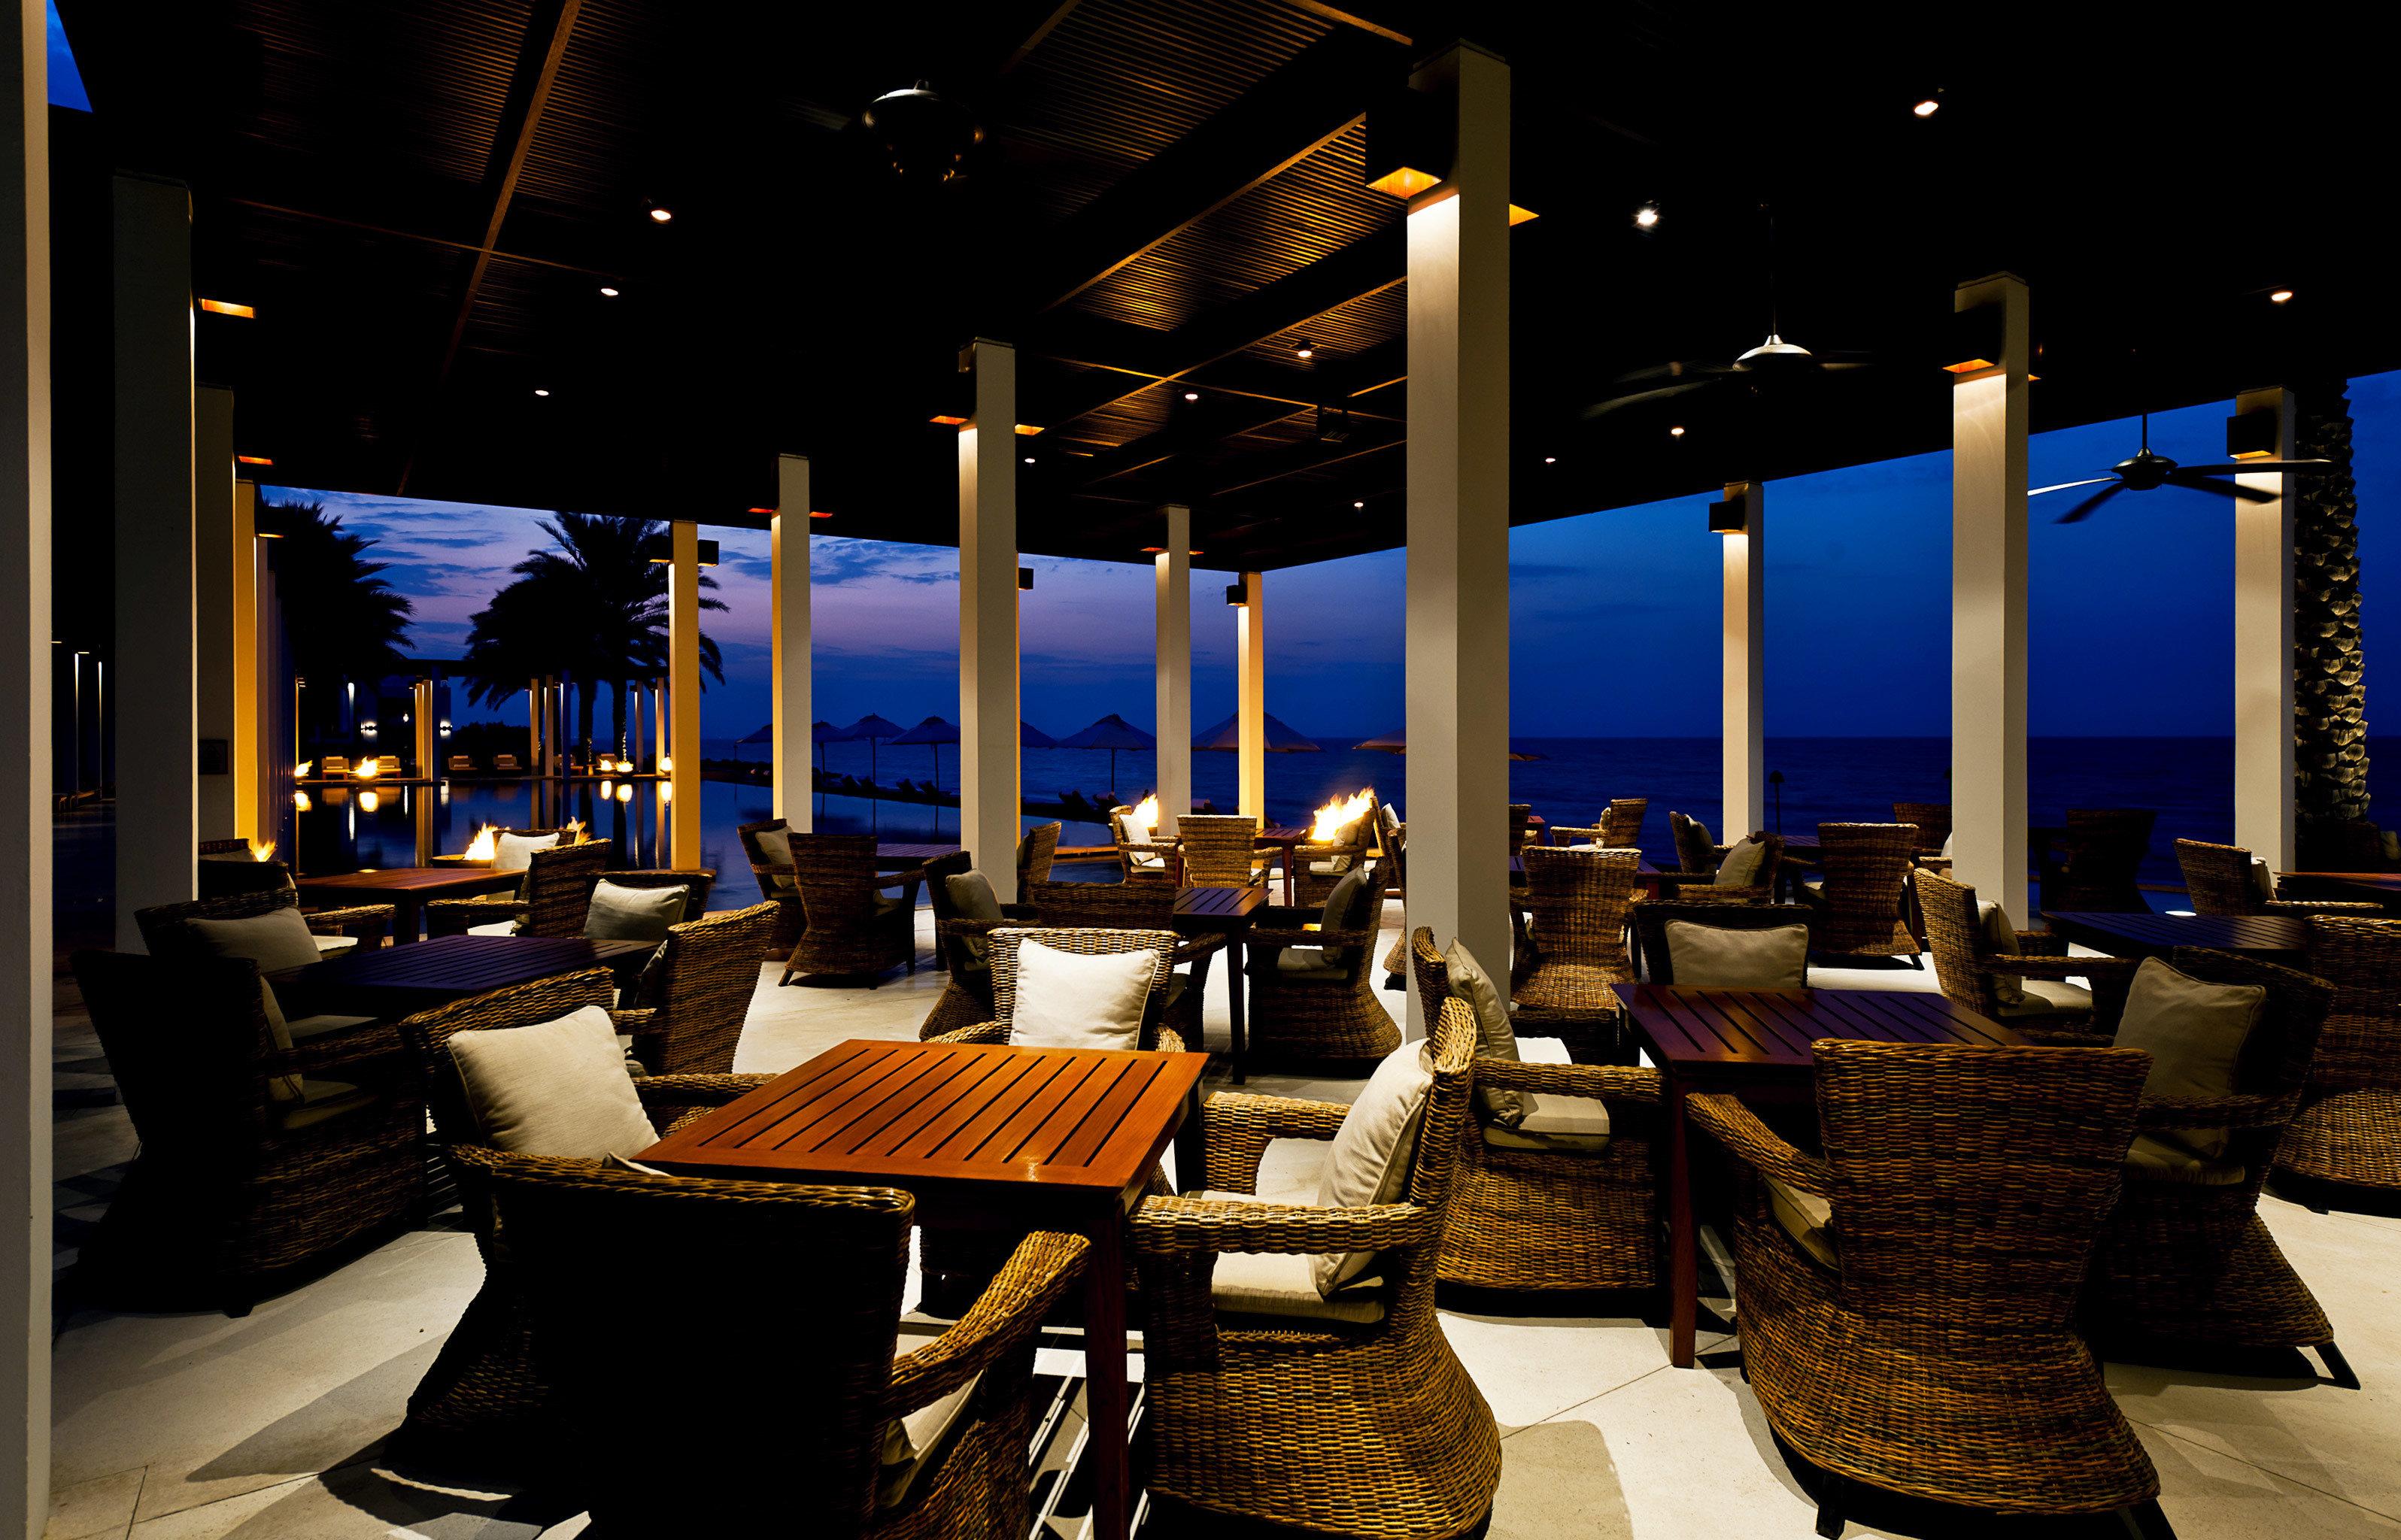 Classic Lounge Nightlife Resort Scenic views chair restaurant